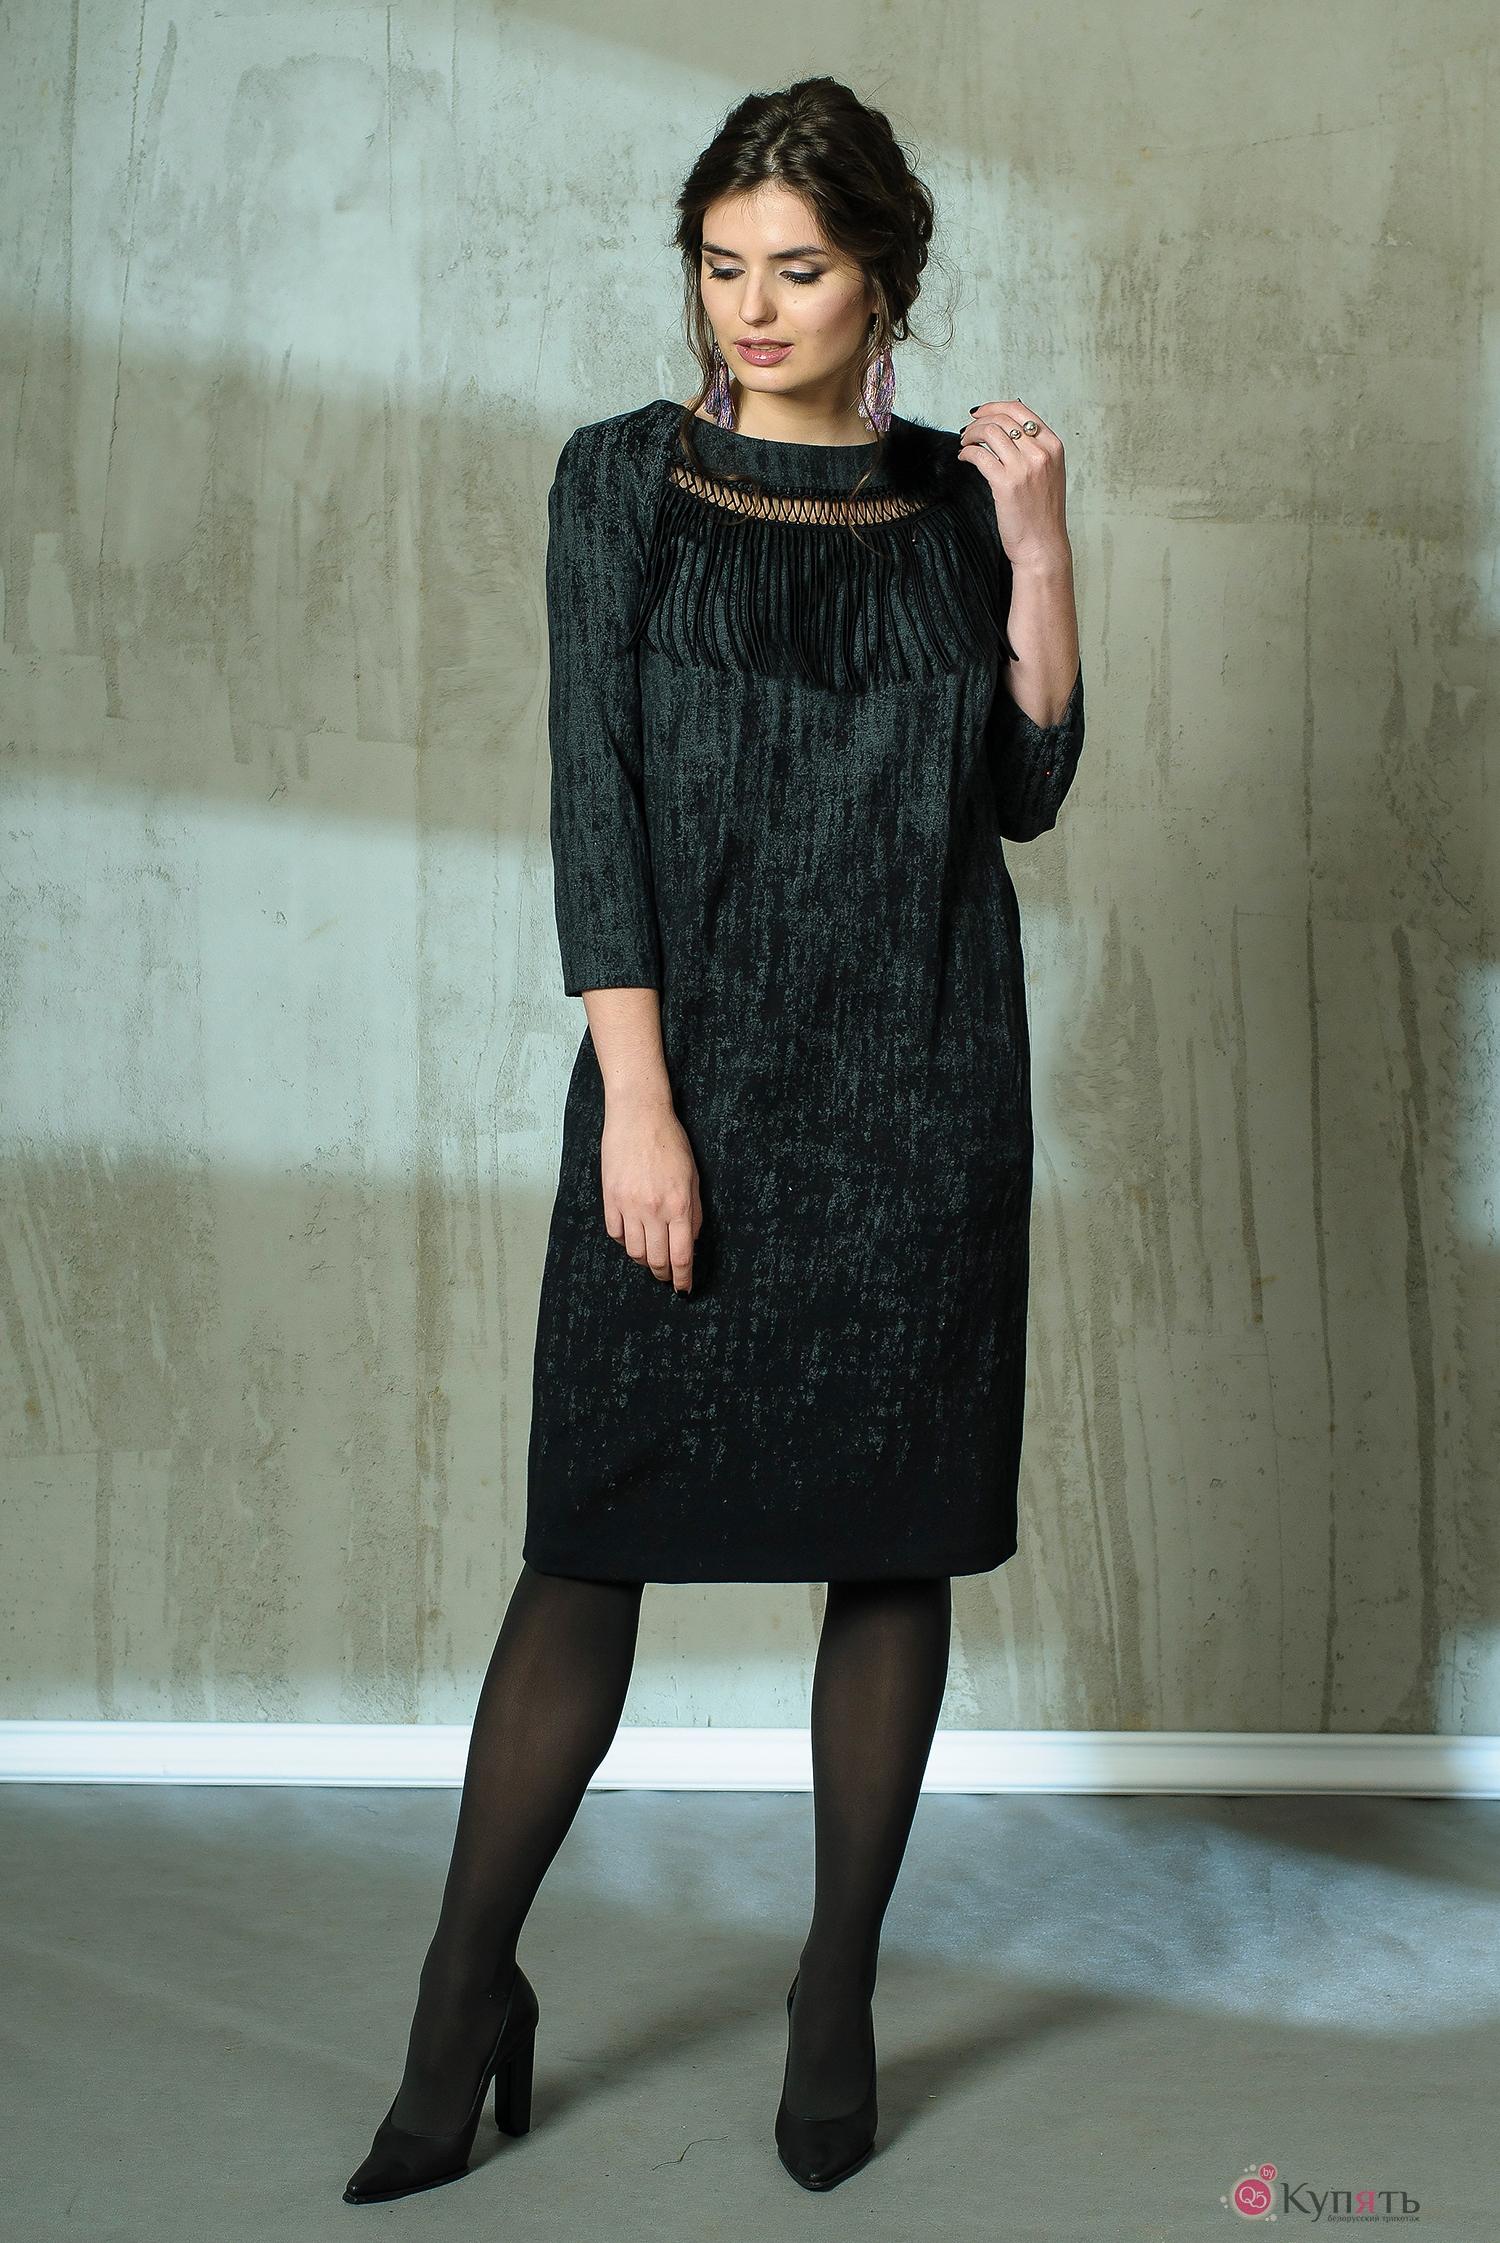 4b593850e0f4 Платье Anna Majewska 1067 - интернет-магазин женской одежды   Q5.by ...